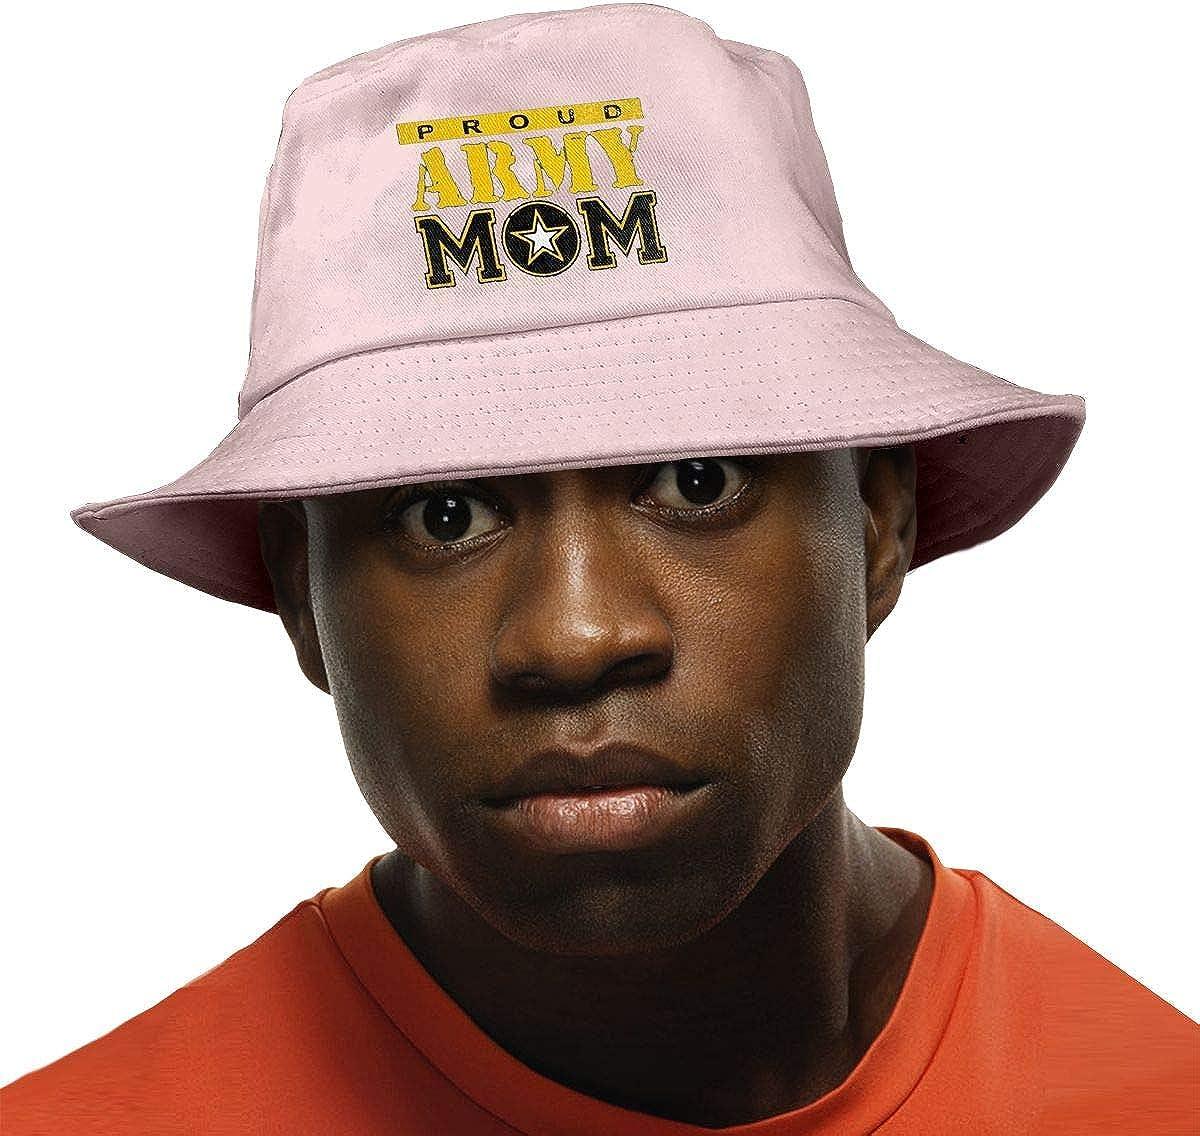 HHCC Proud Army Mom Unisex...